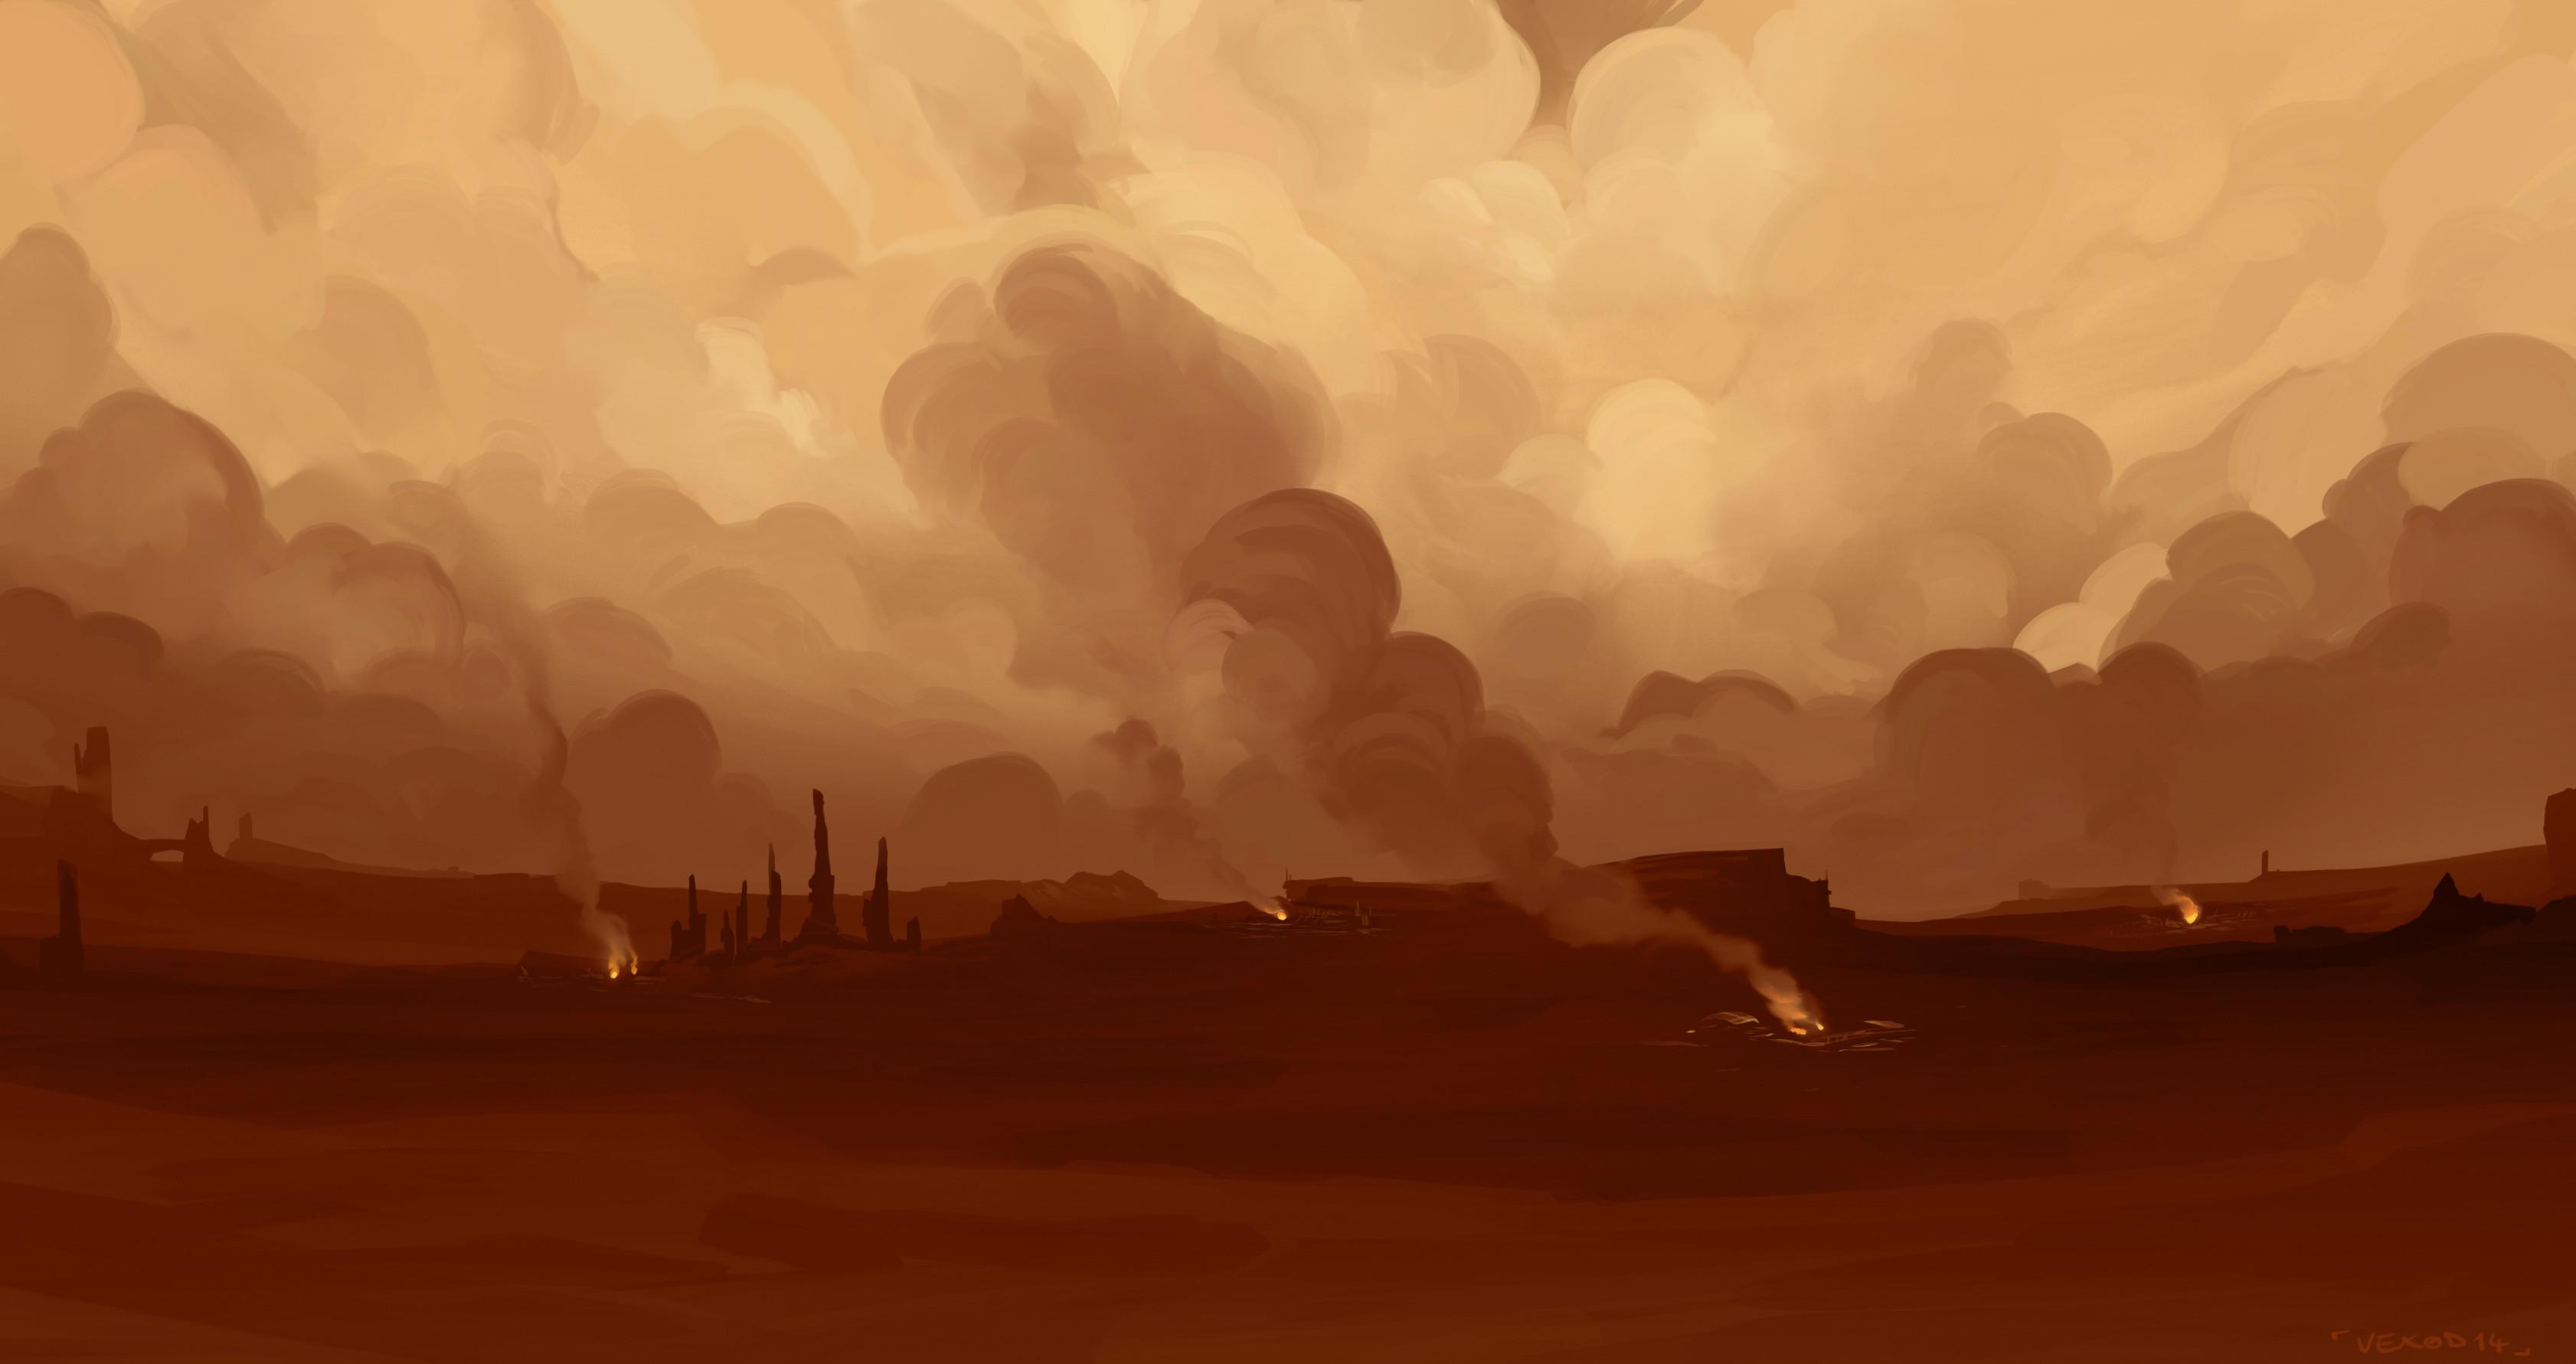 Geonosis environment background - Photoshop